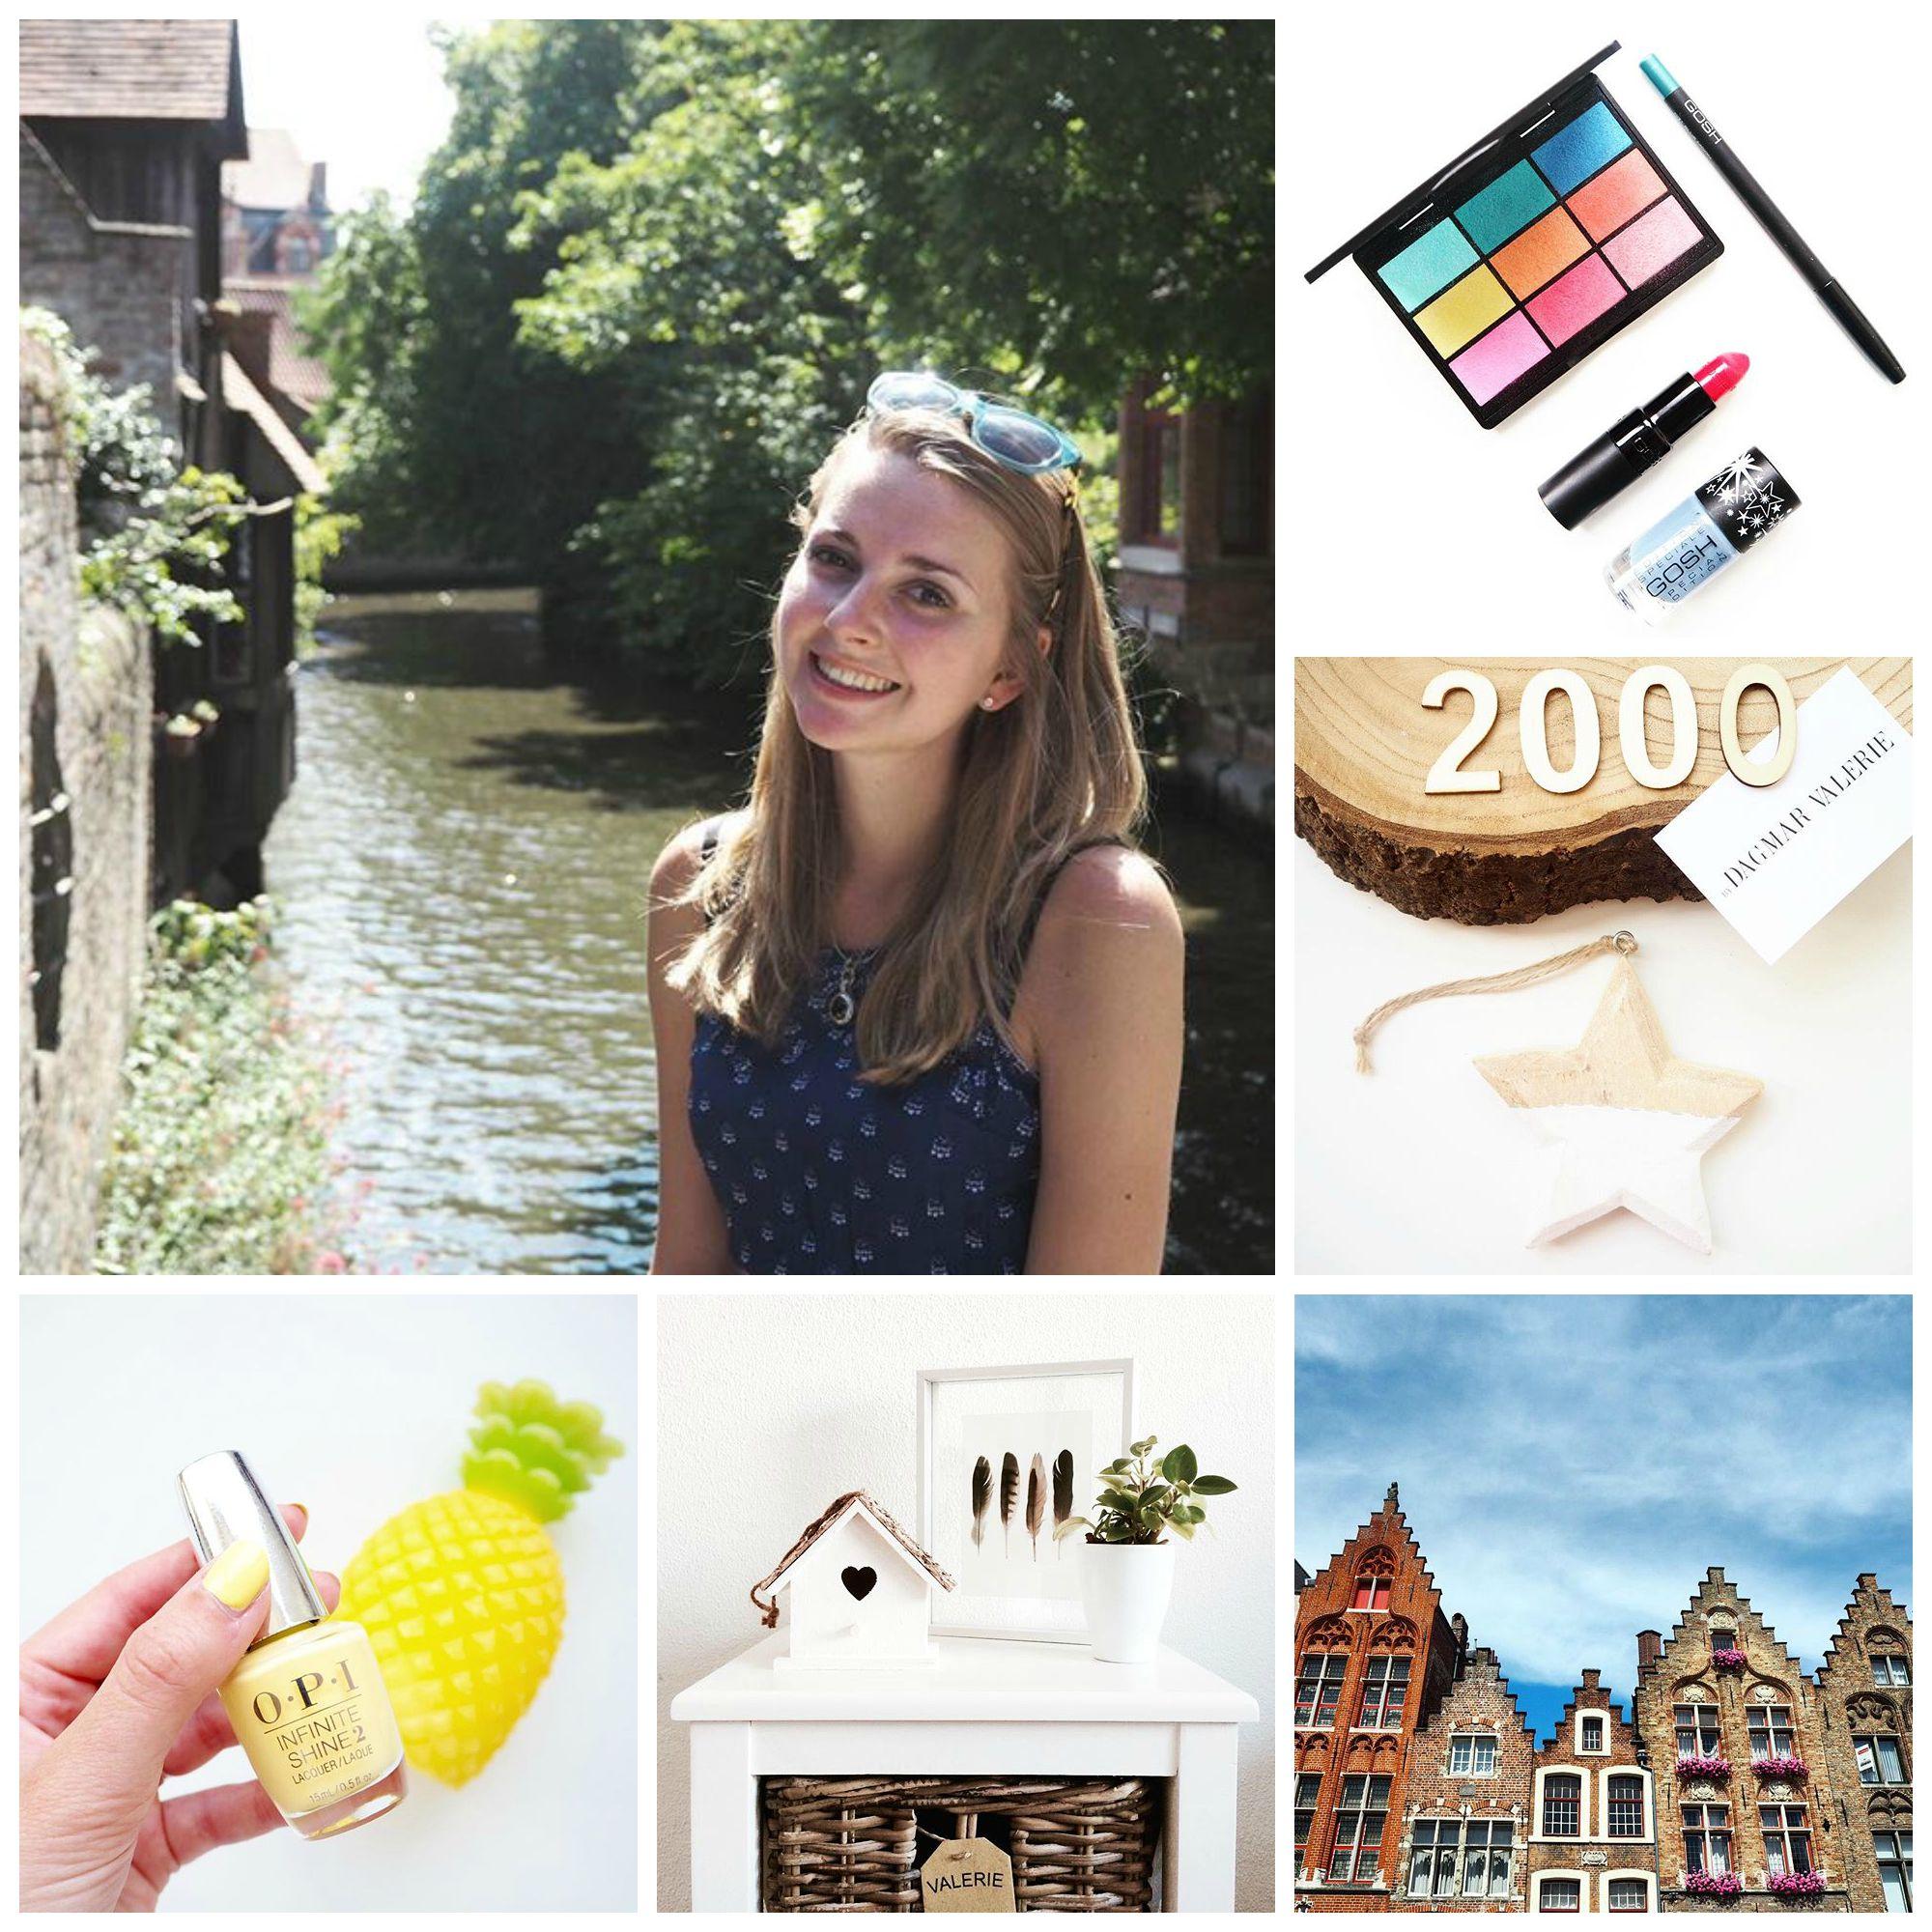 Behind the scenes #102 – Brugge, 2000 volgers en Zomer